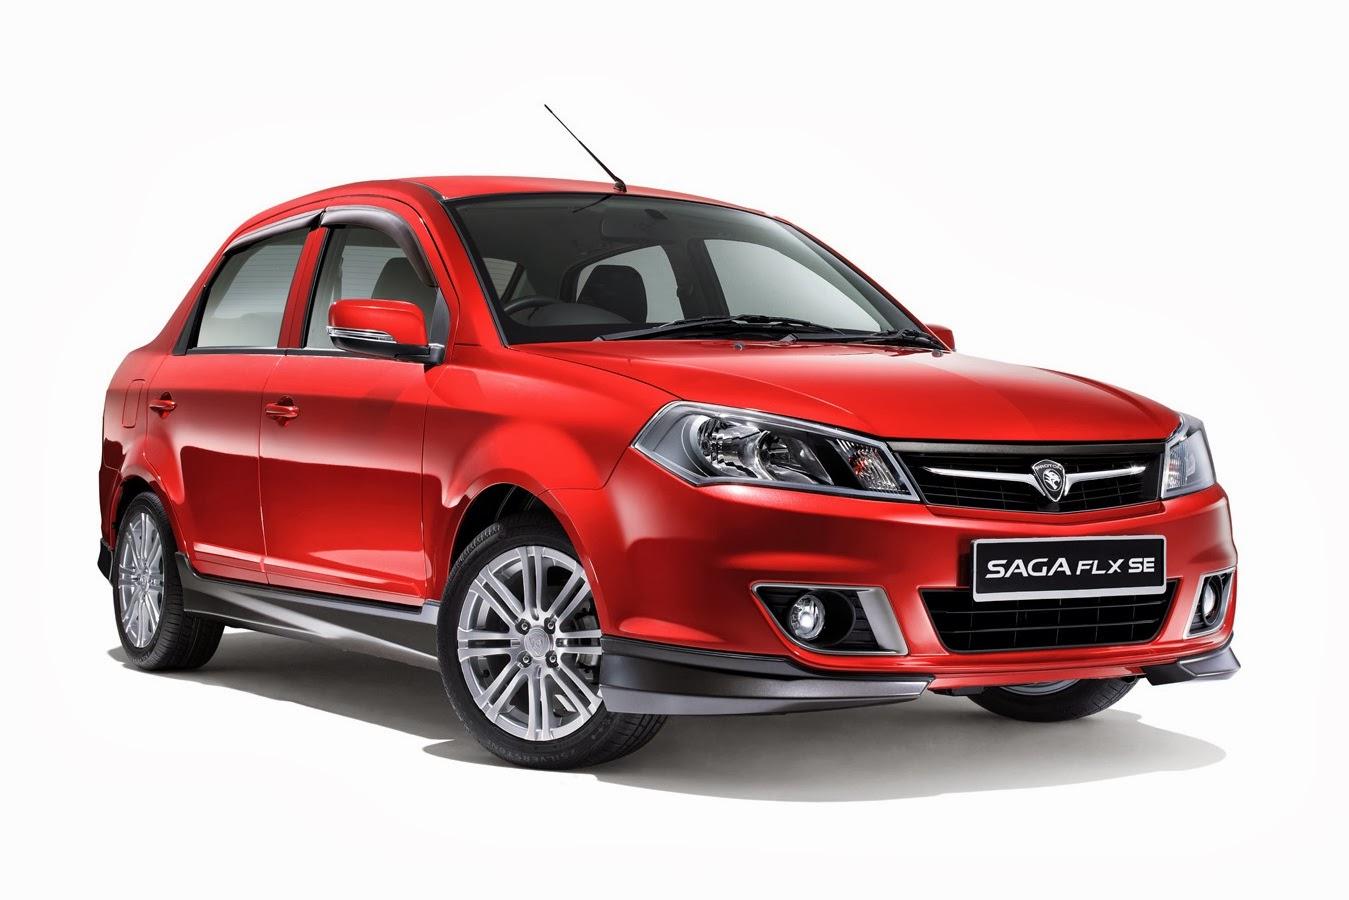 Spesifikasi Proton Saga FLX, Spesifikasi Otomotif Terbaru by Otospek